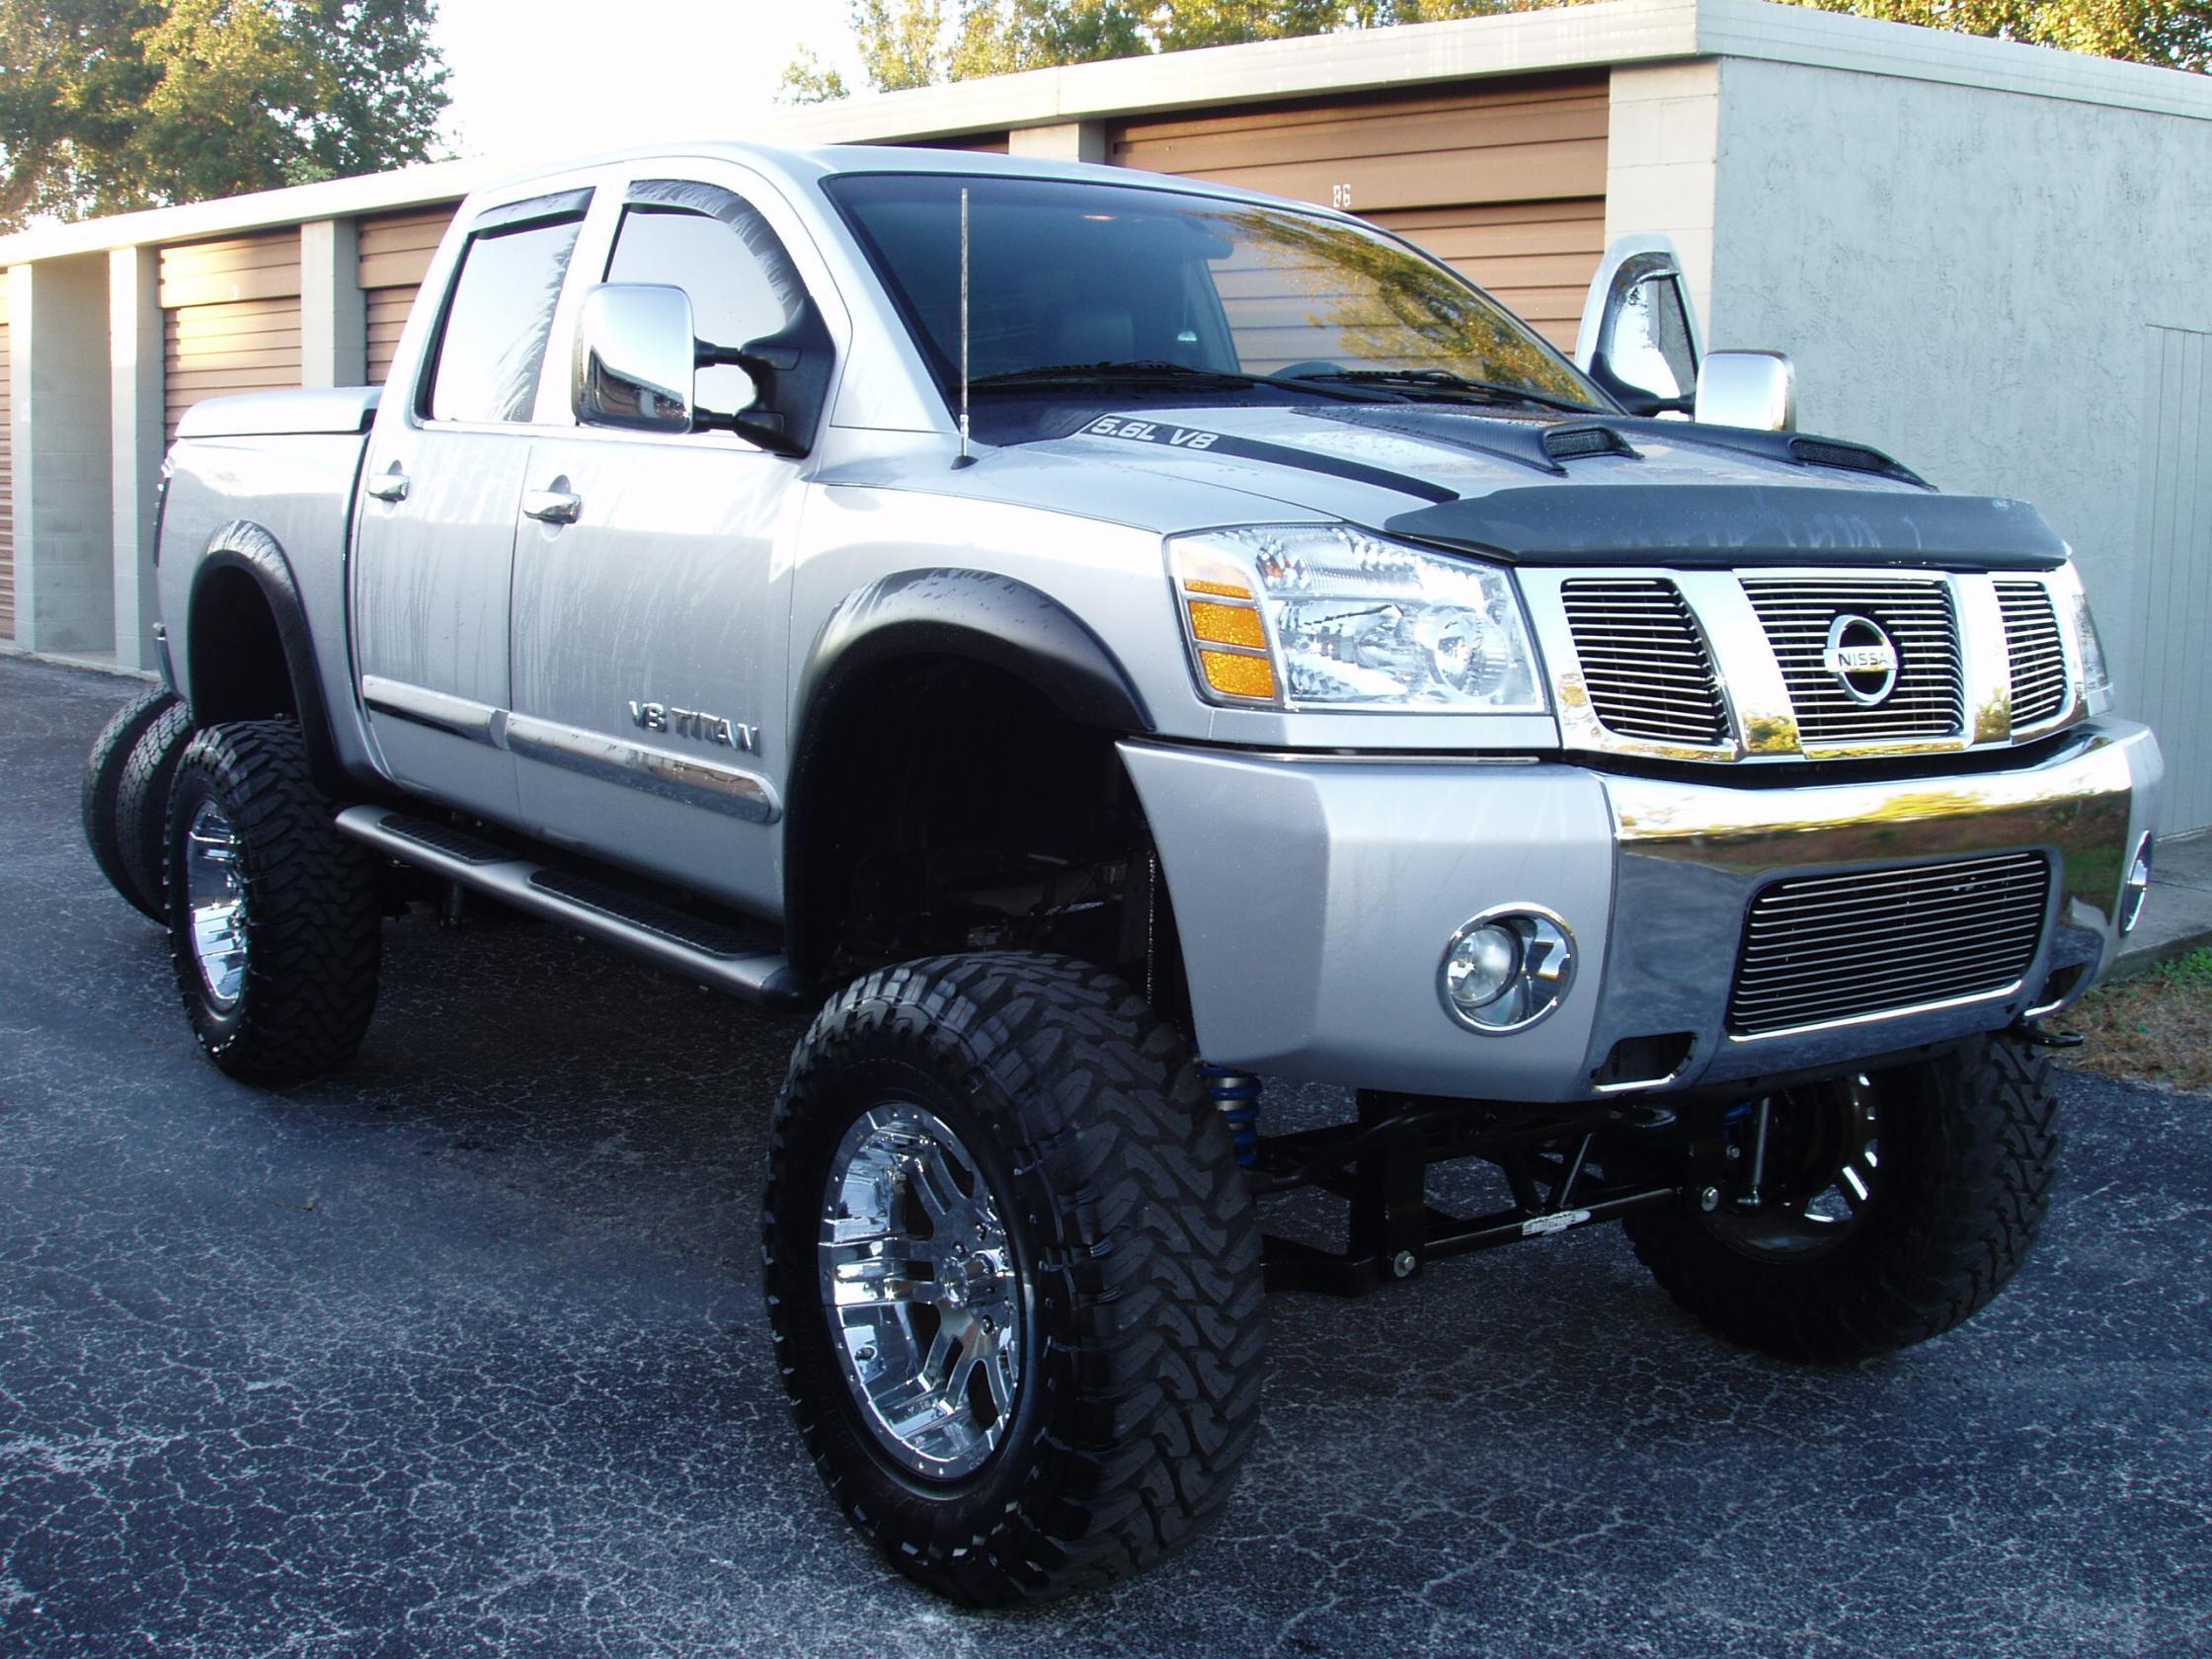 2005 nissan titan le crewcab for sale tires rims 032 jpg